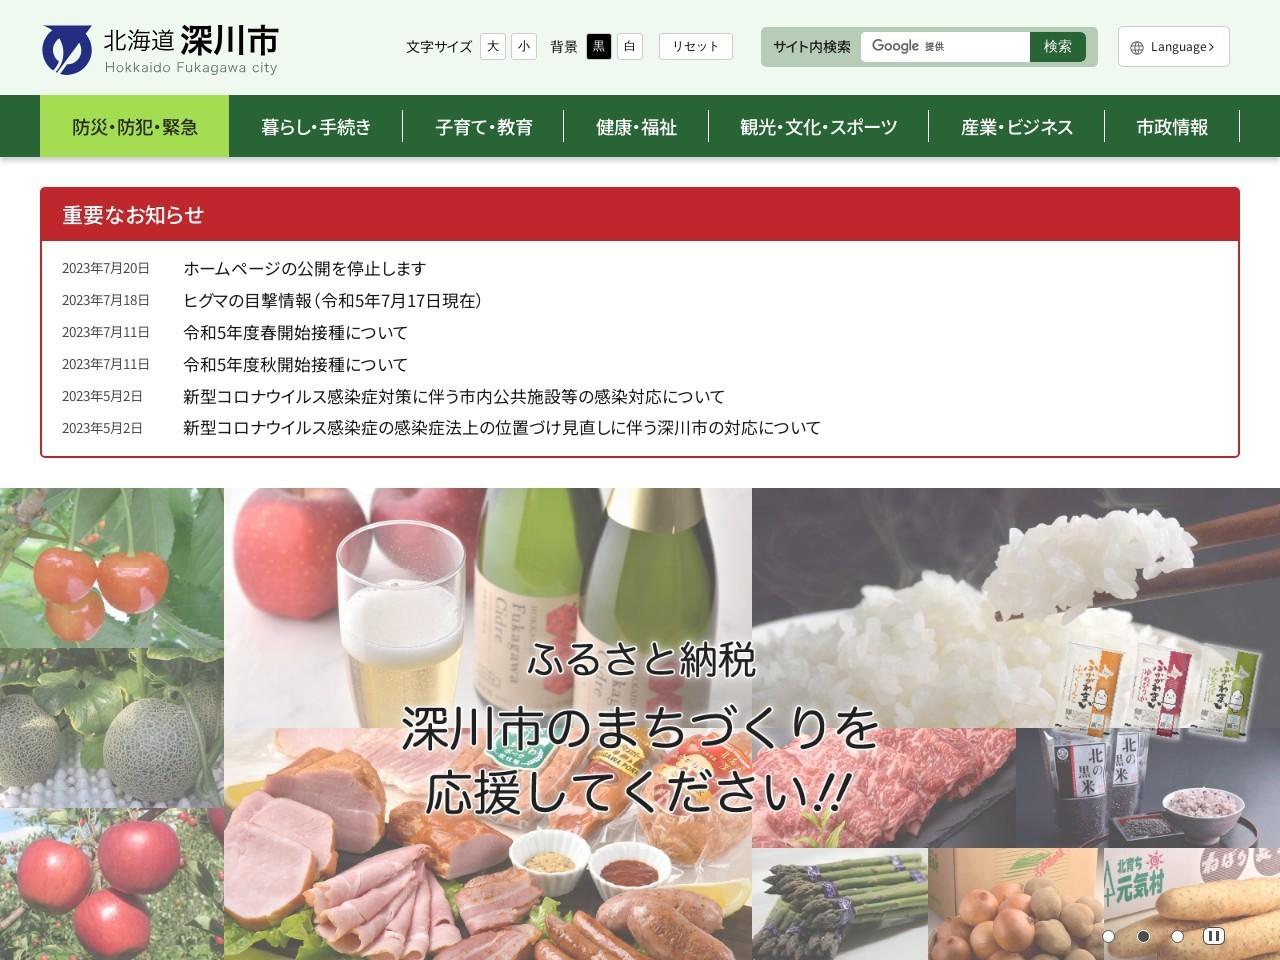 https://www.city.fukagawa.lg.jp/cms/section/shoubou/dbj8cg00000052b5.html